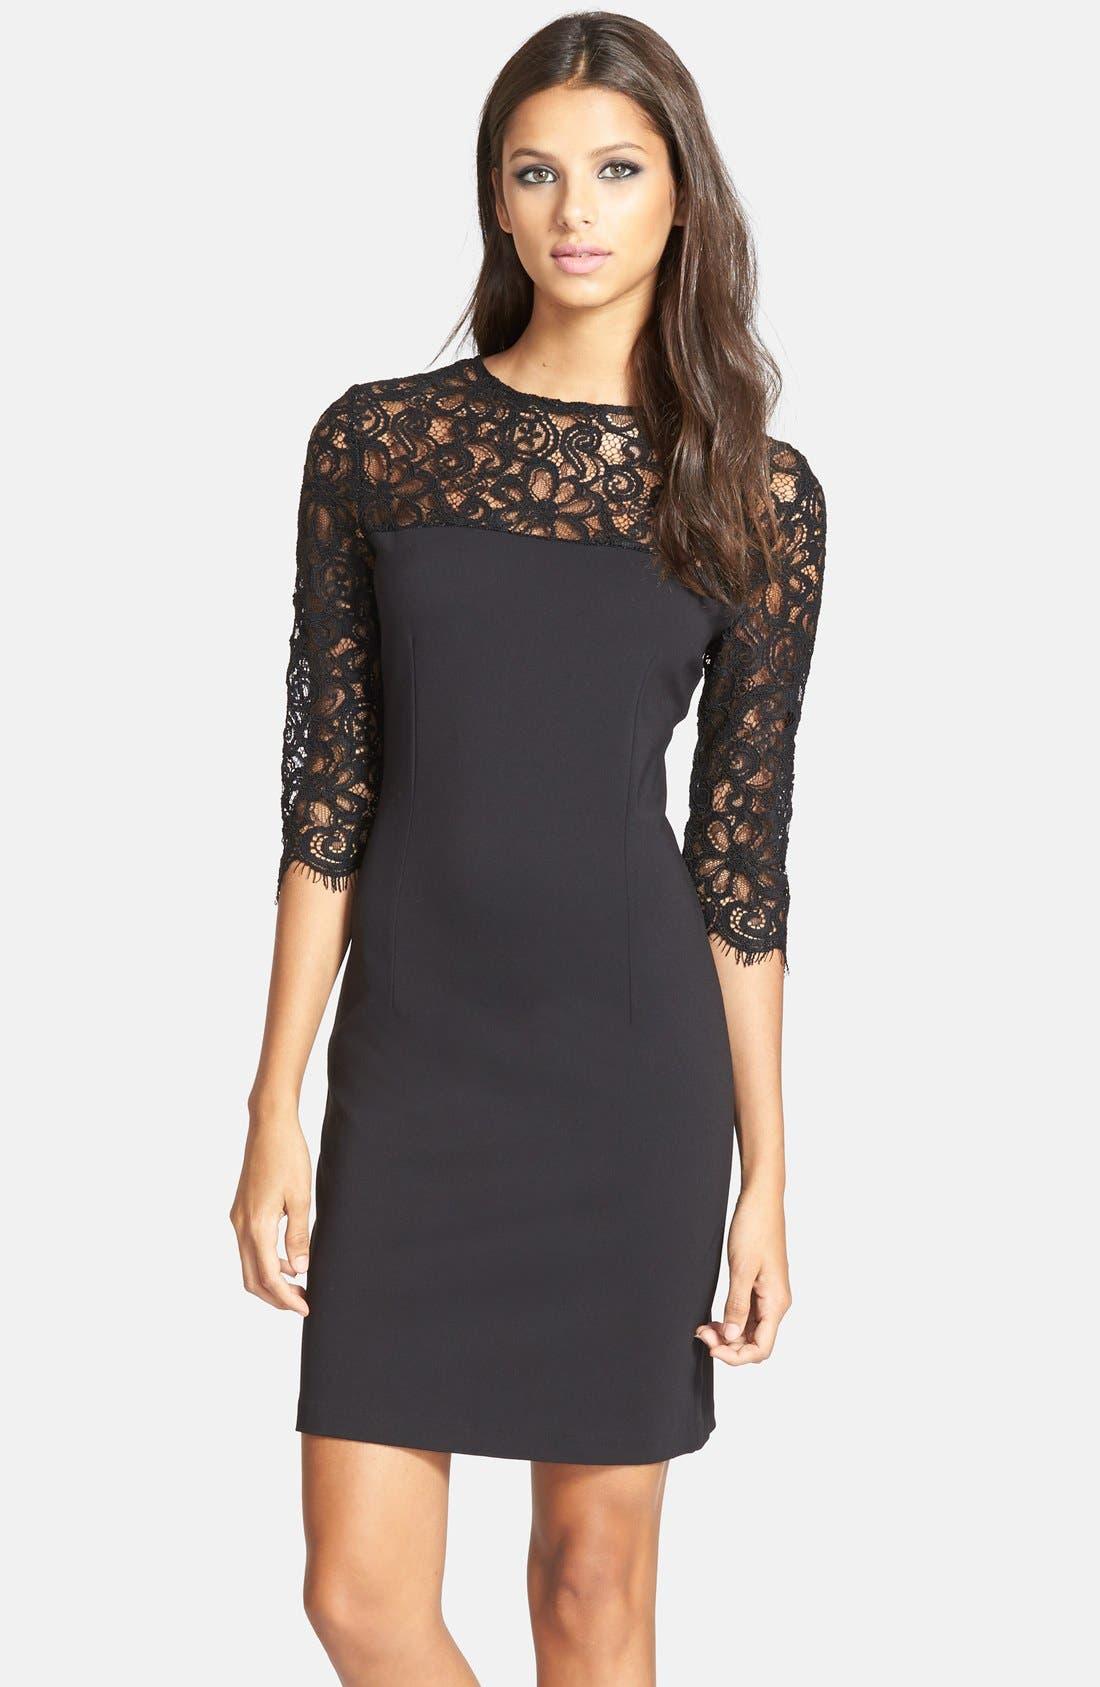 Alternate Image 1 Selected - BB Dakota 'Chevis' Lace & Ponte Sheath Dress